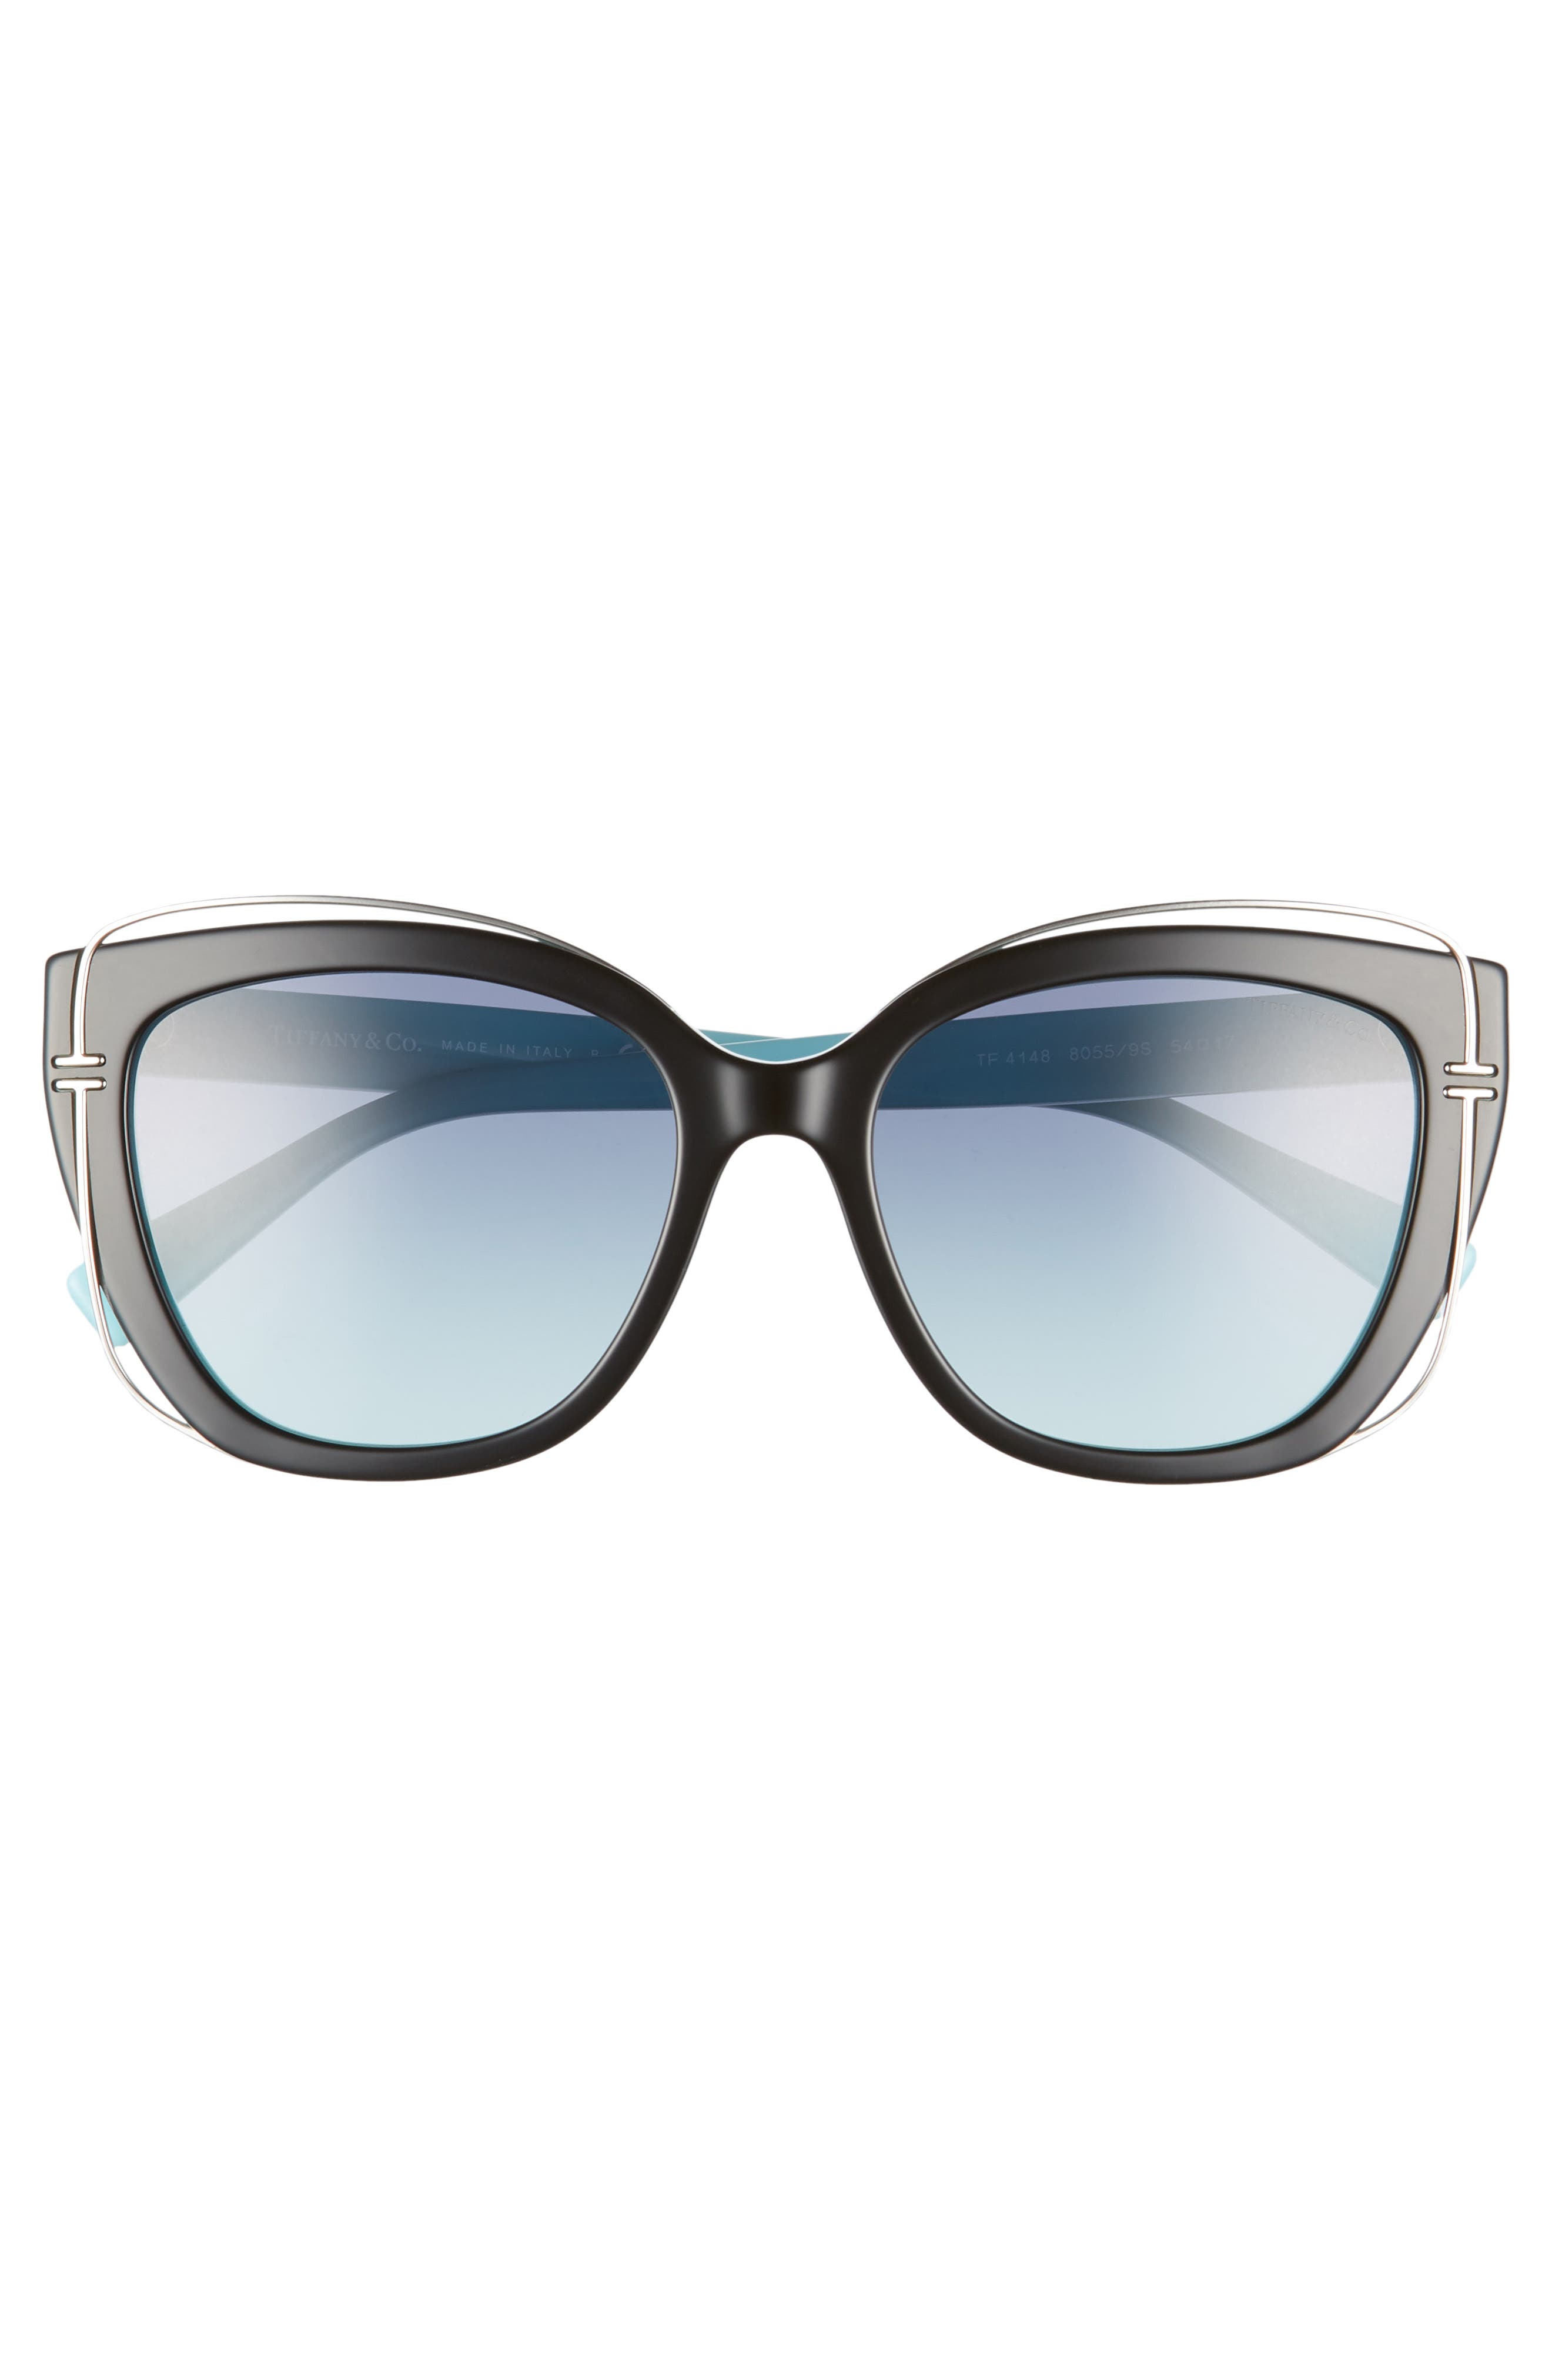 54mm Gradient Cat Eye Sunglasses,                             Alternate thumbnail 3, color,                             BLACK/ BLUE GRADIENT